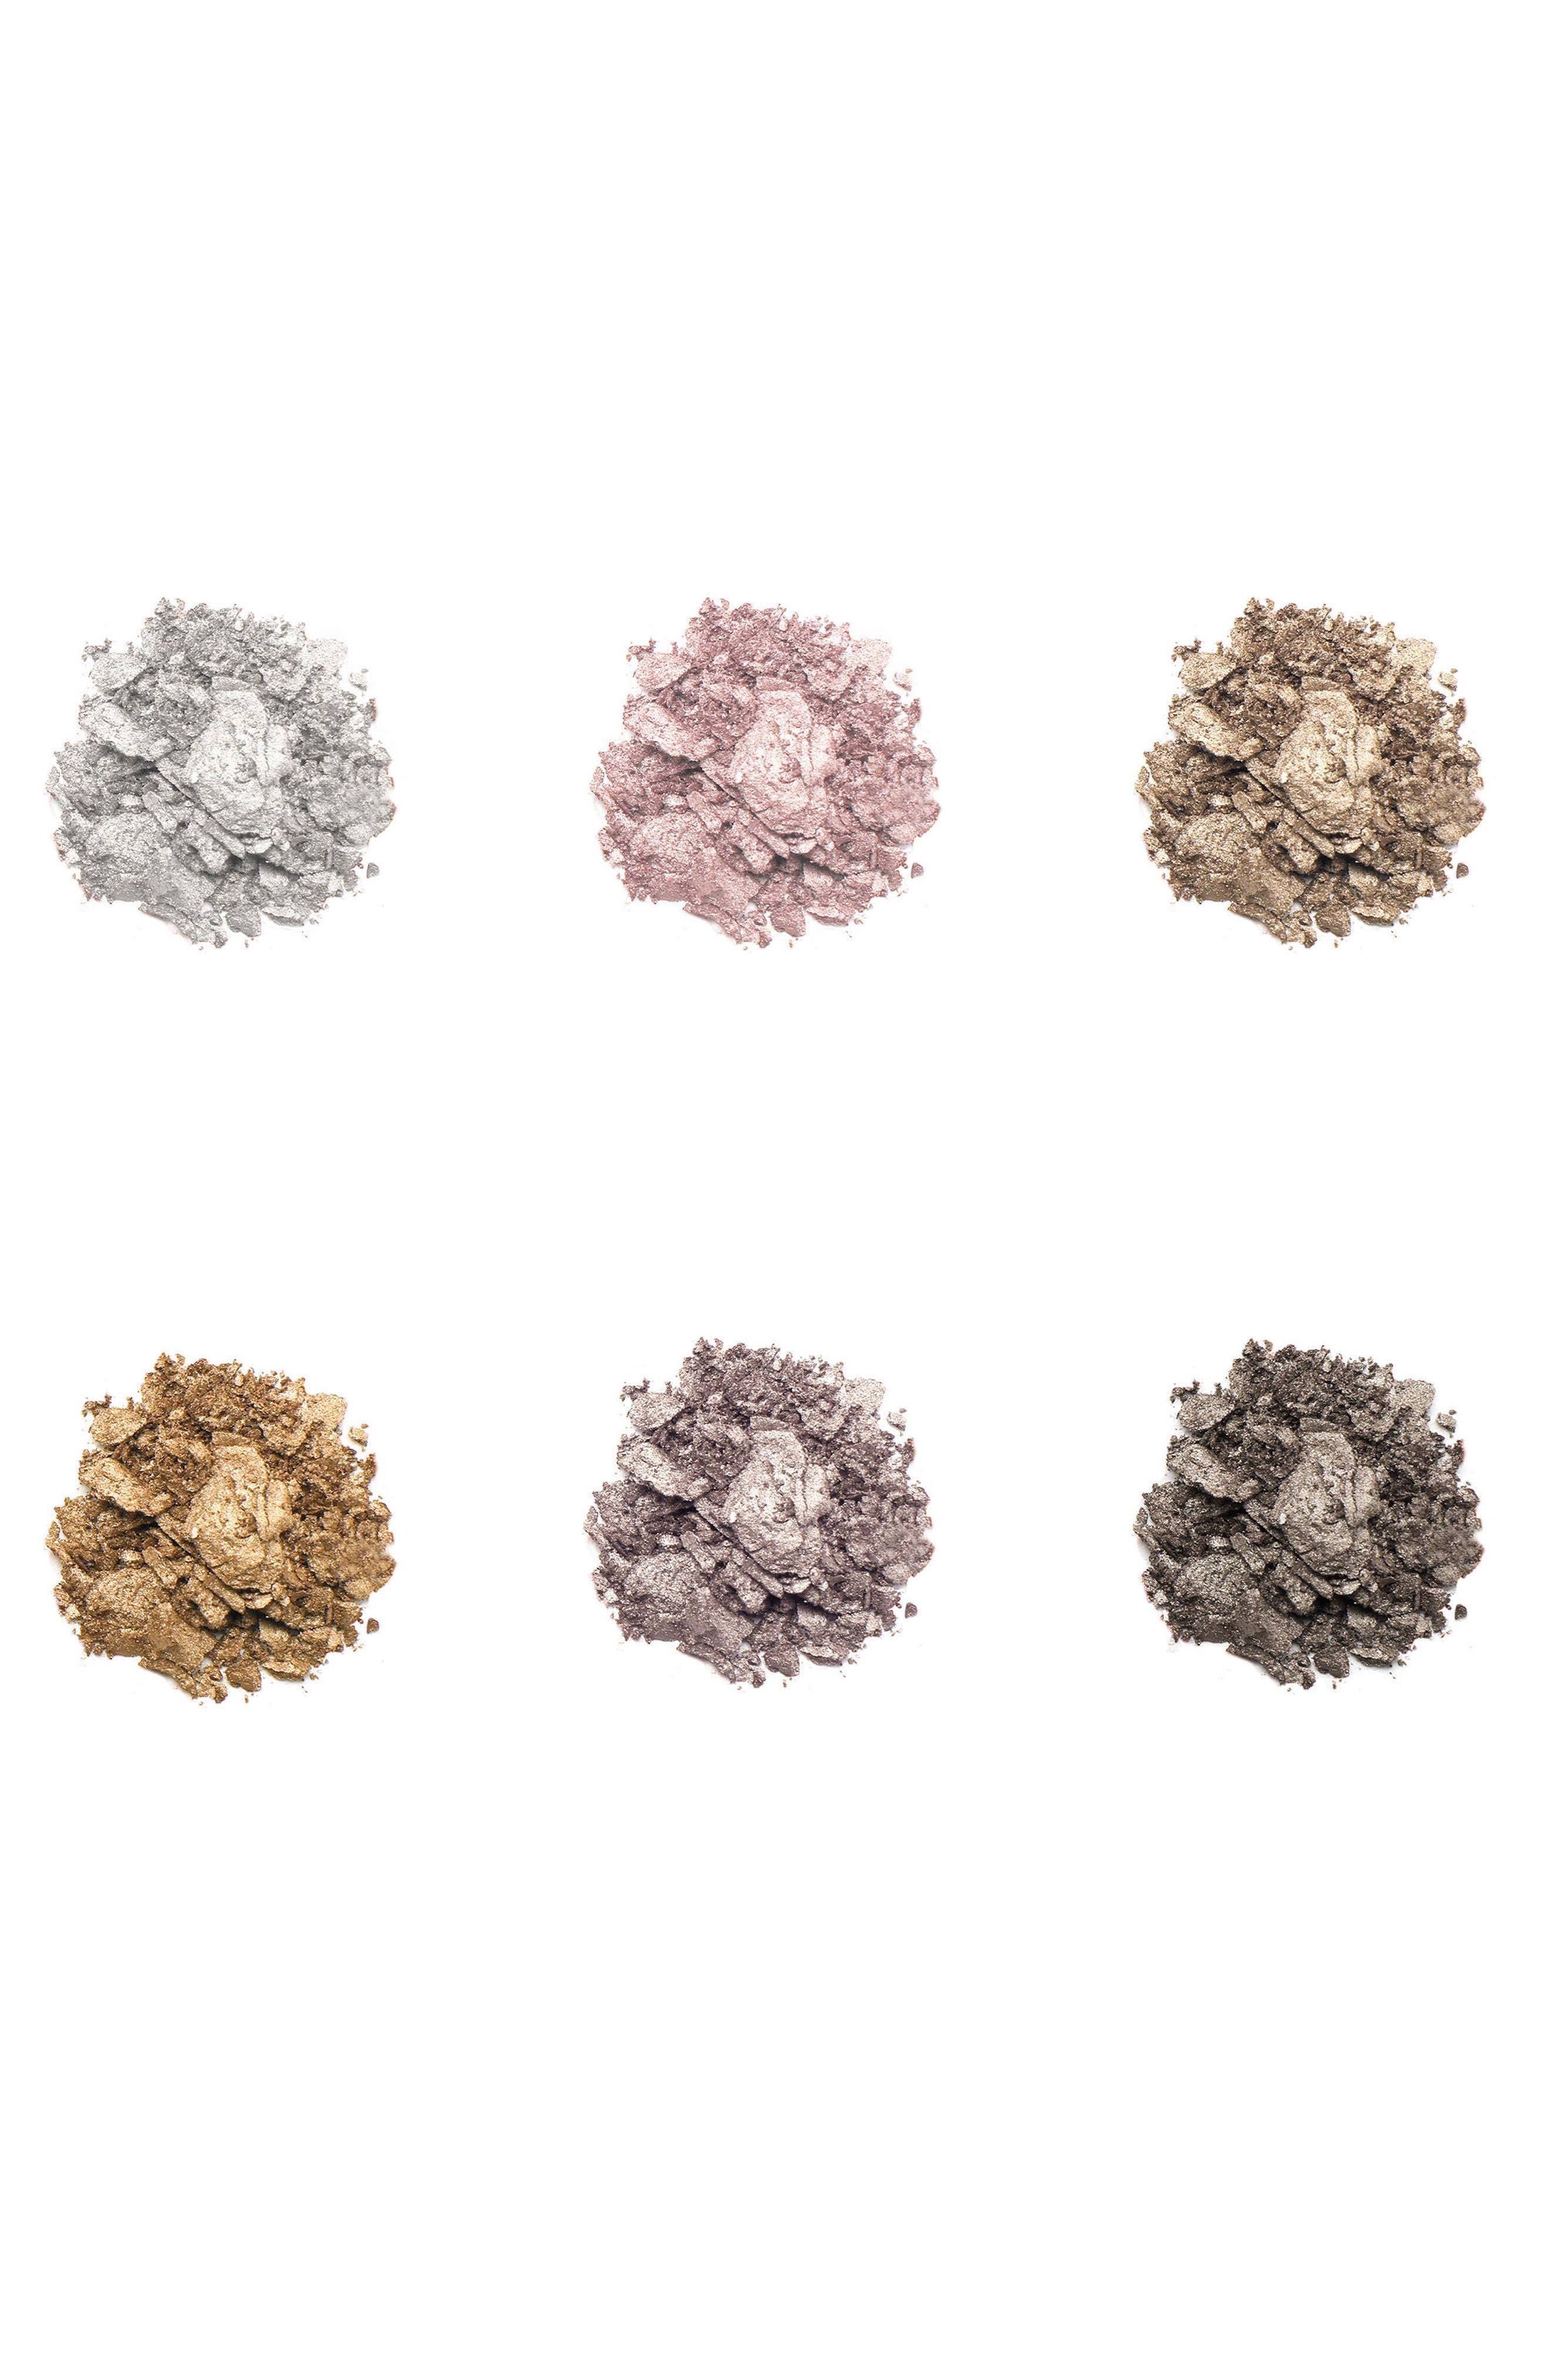 Skinny Dip Ultra Foil Shimmer Shadows Palette,                             Alternate thumbnail 2, color,                             No Color